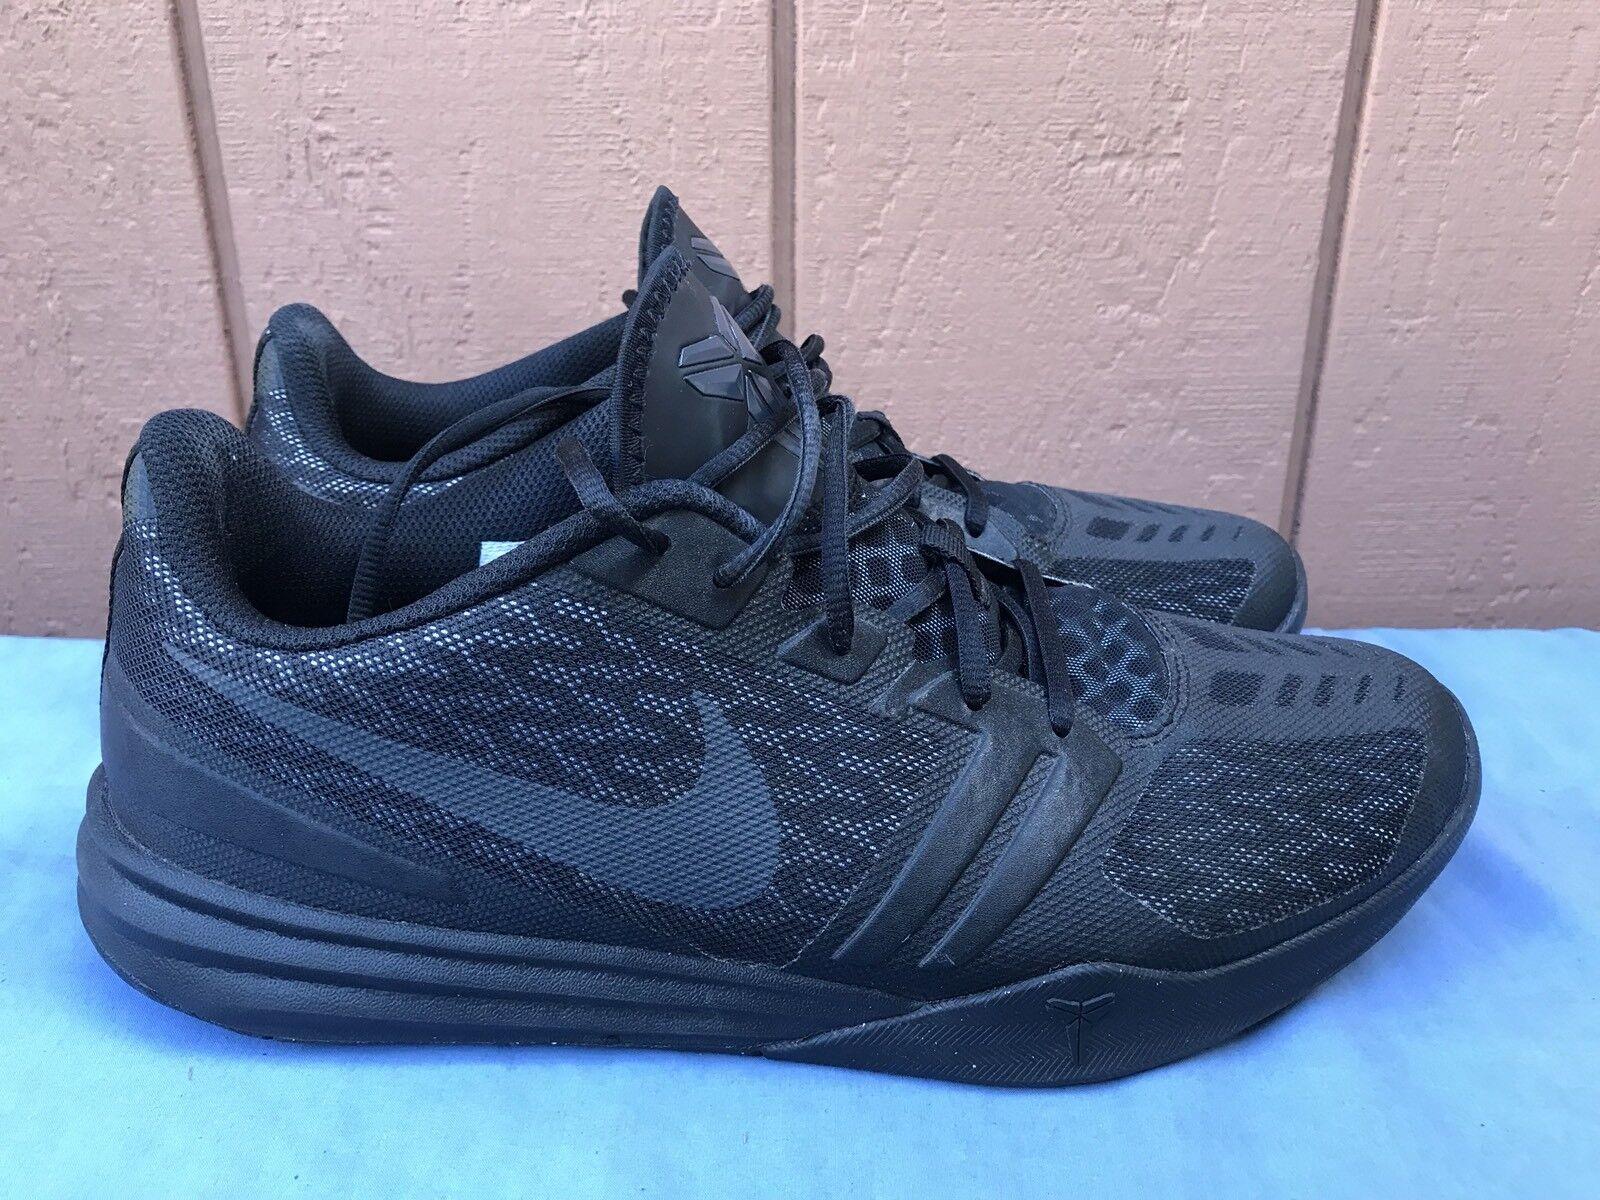 EUC! Nike Kobe KB Men US 11 Mentality Black Anthracite Basketball 704942-002 A7